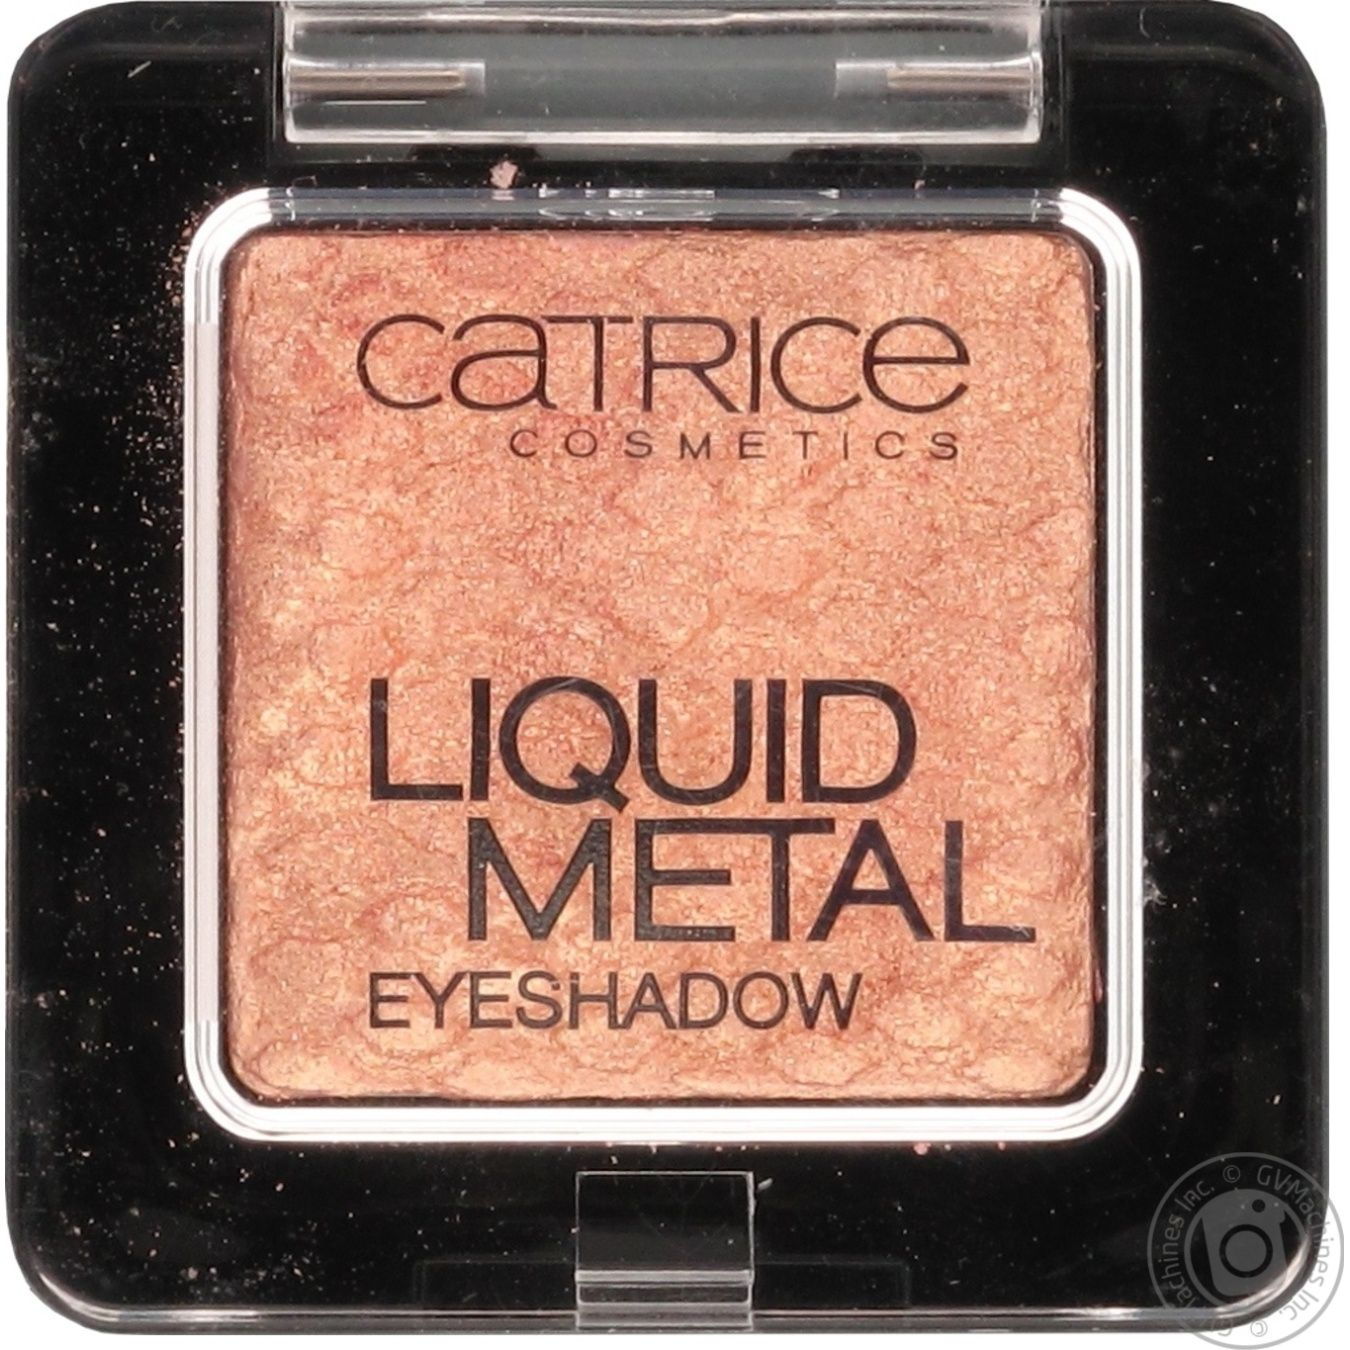 Catrice Liquid Metal Eyeshadow 020 → Zakaz.ua - Official Online Grocery for Supermarkets in Ukraine - Buy Catrice Liquid Metal Eyeshadow 020, Delivery